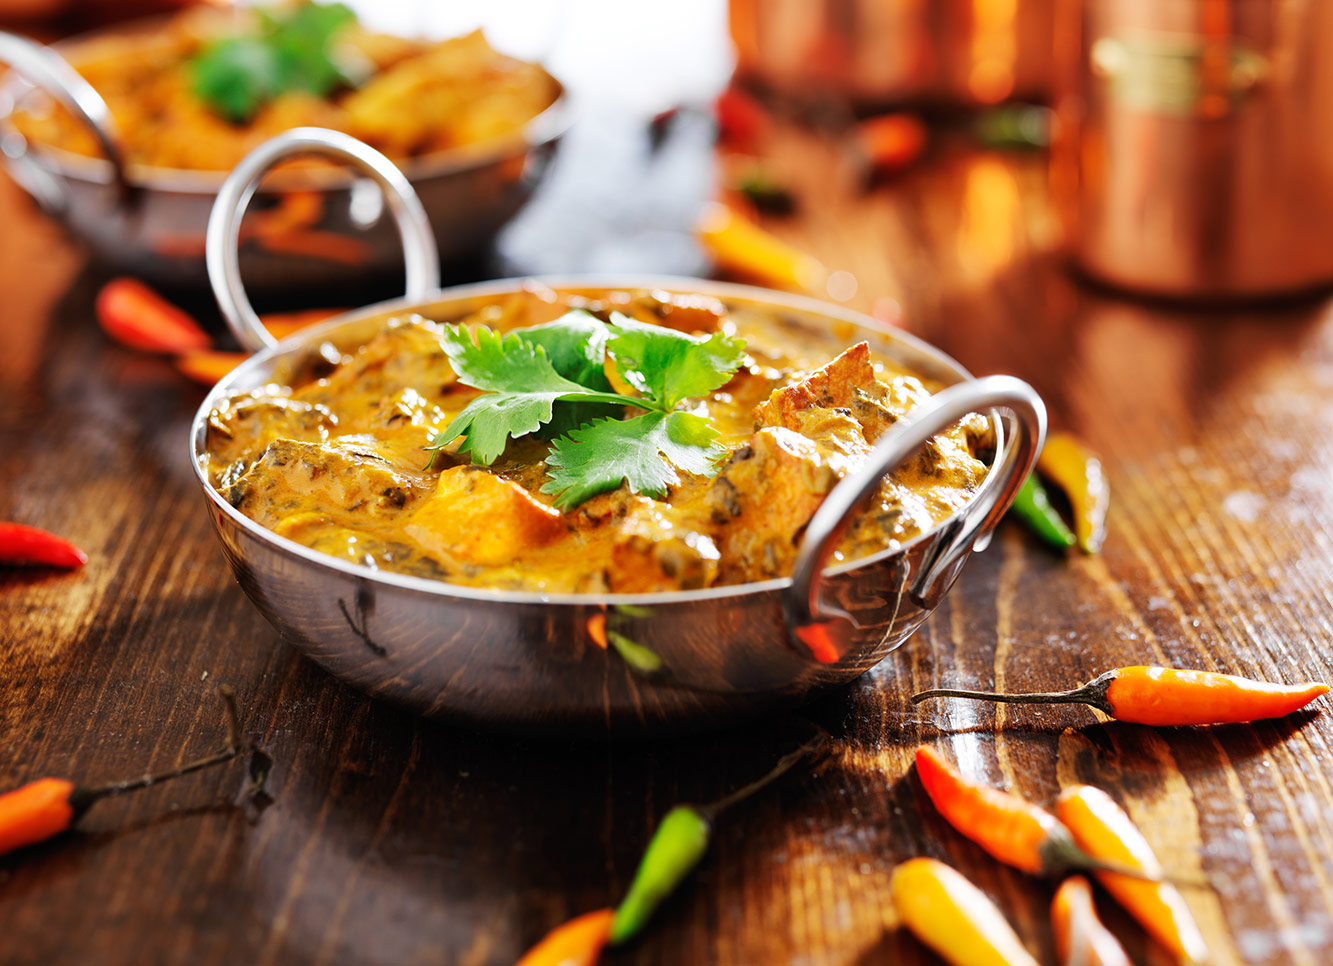 Indian Food The Masala Bangladeshi Takeaway WA14